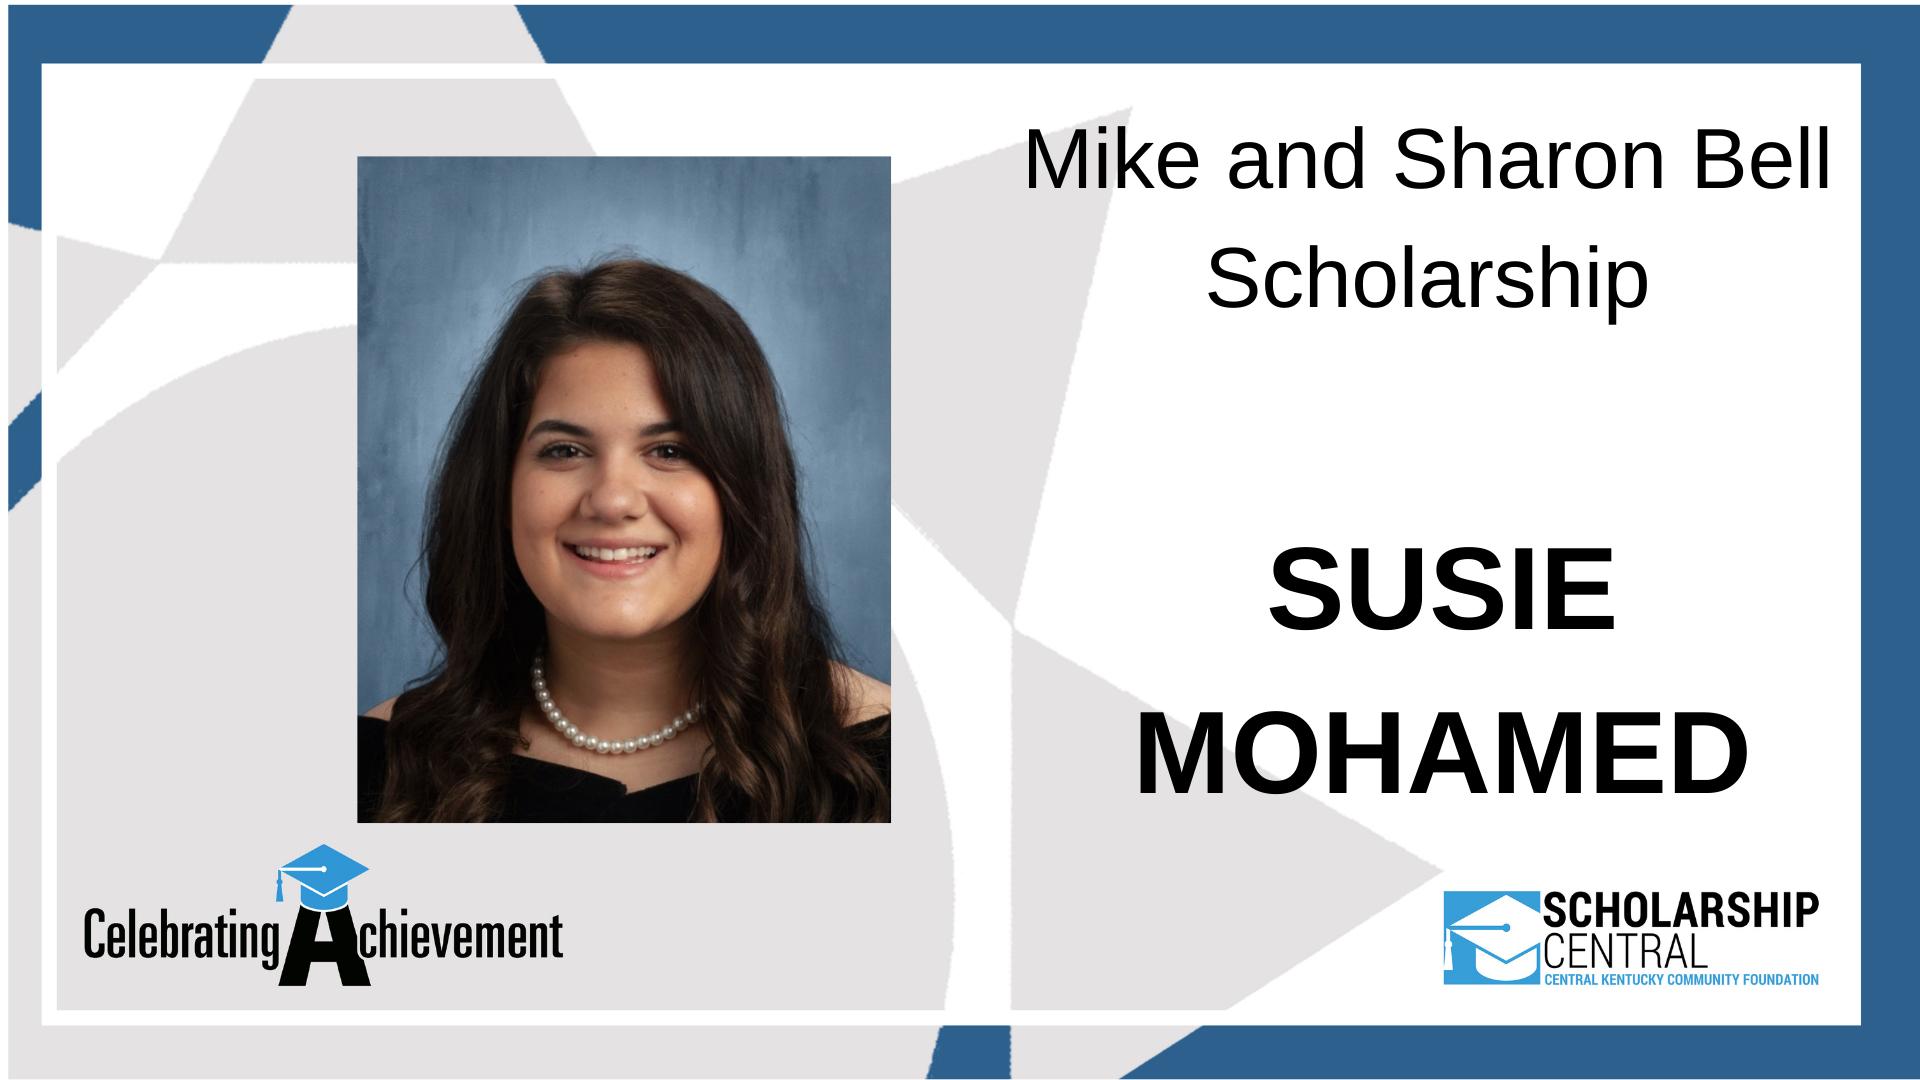 Mike and Sharon Bell Scholarship Winner